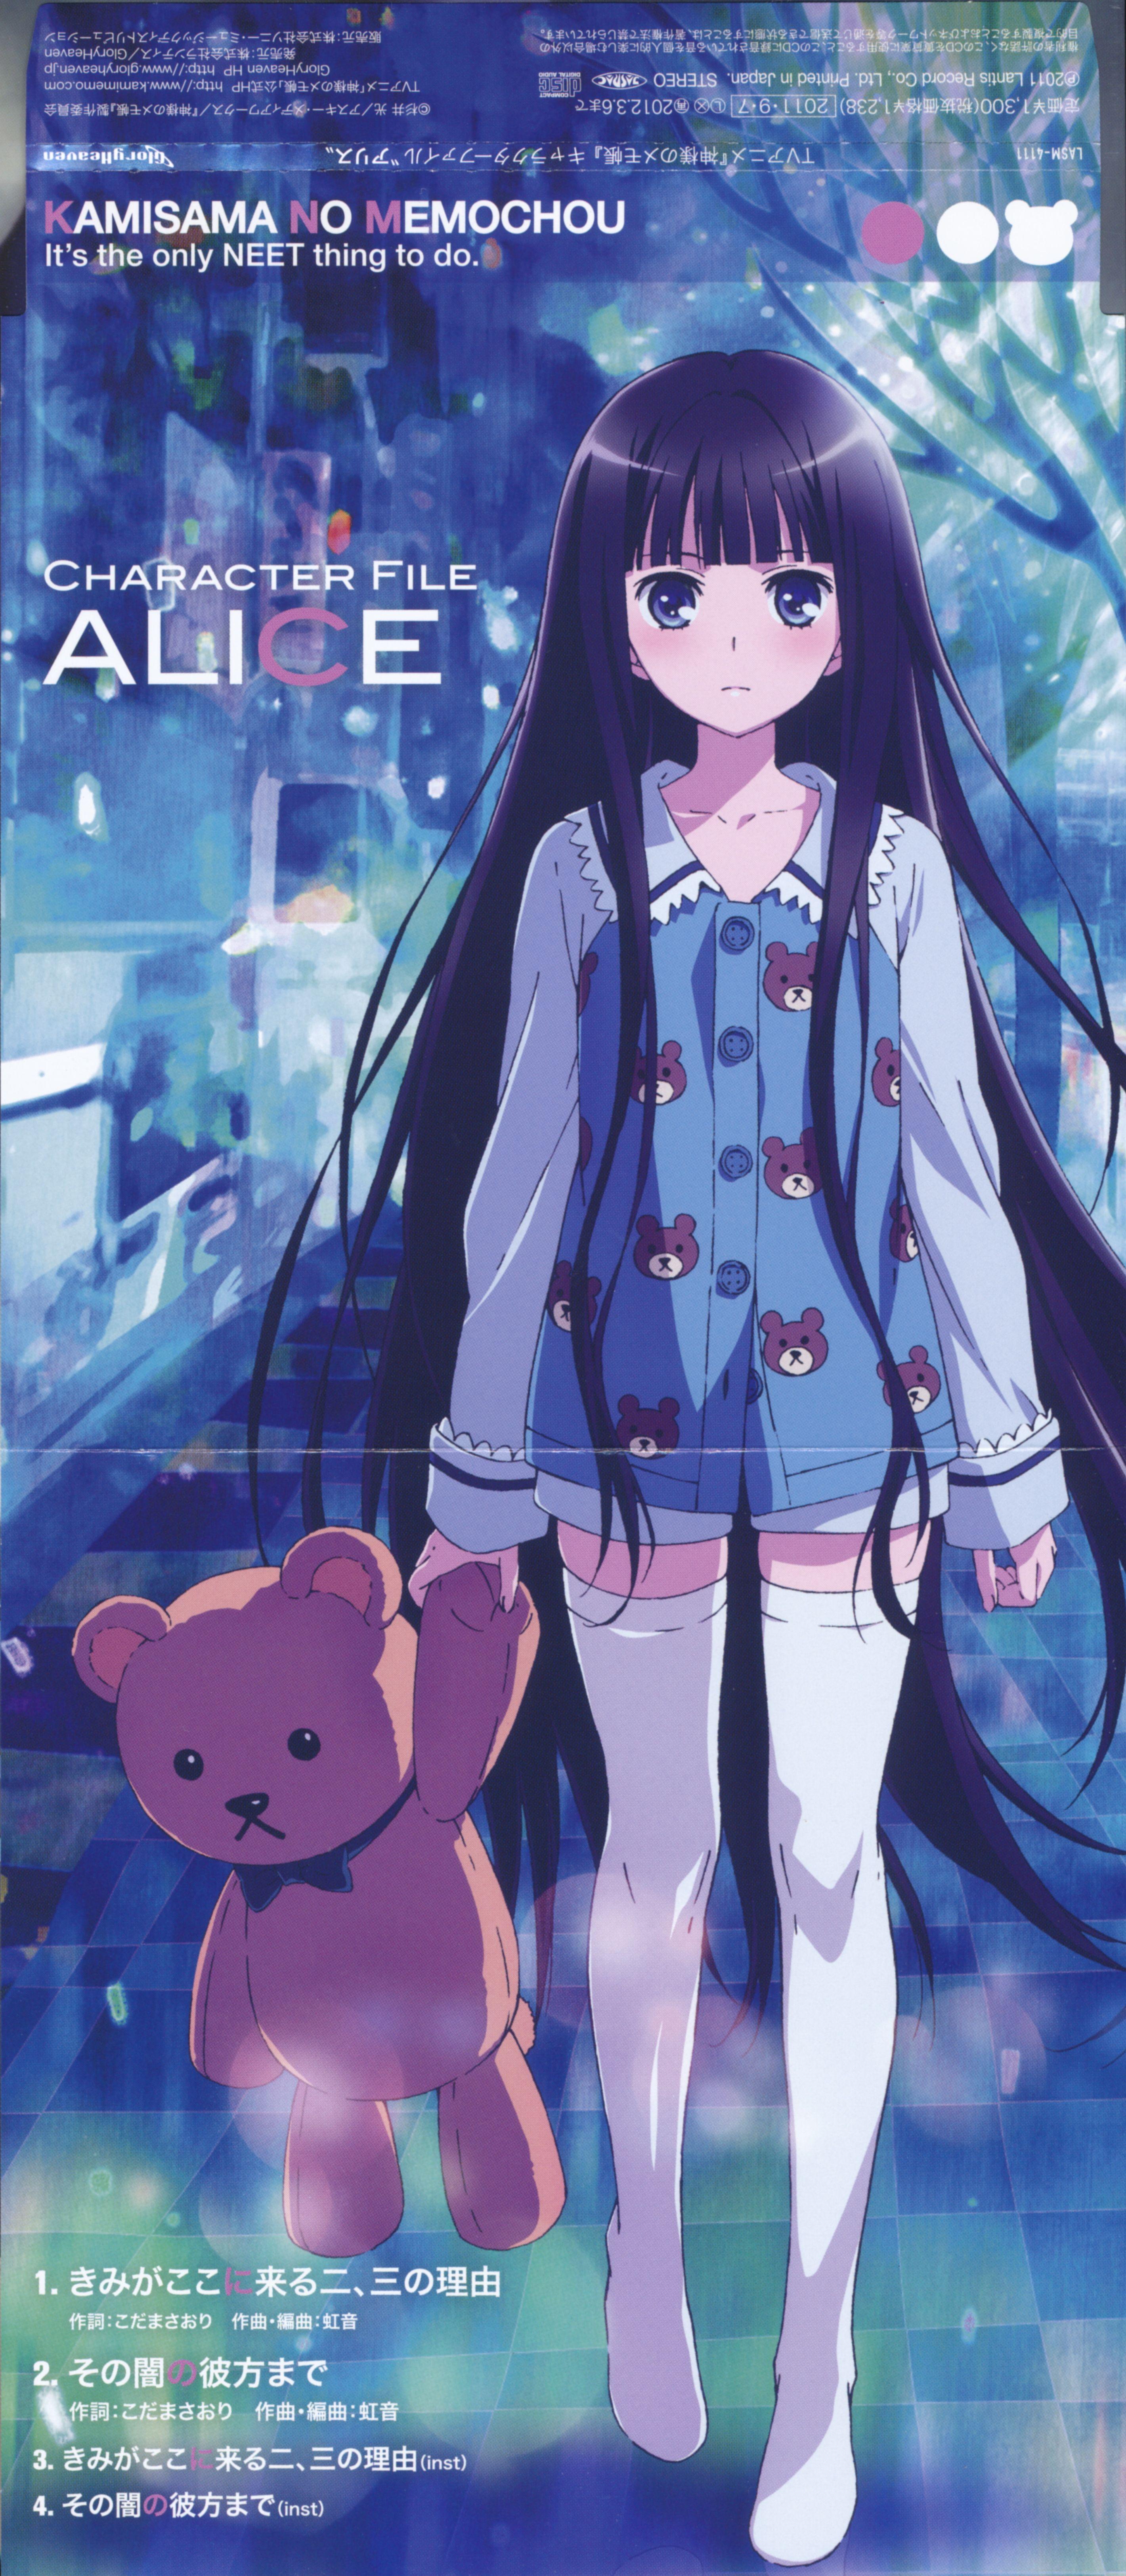 Kamisama No Memochou Just Finished Watching This Anime I Loved